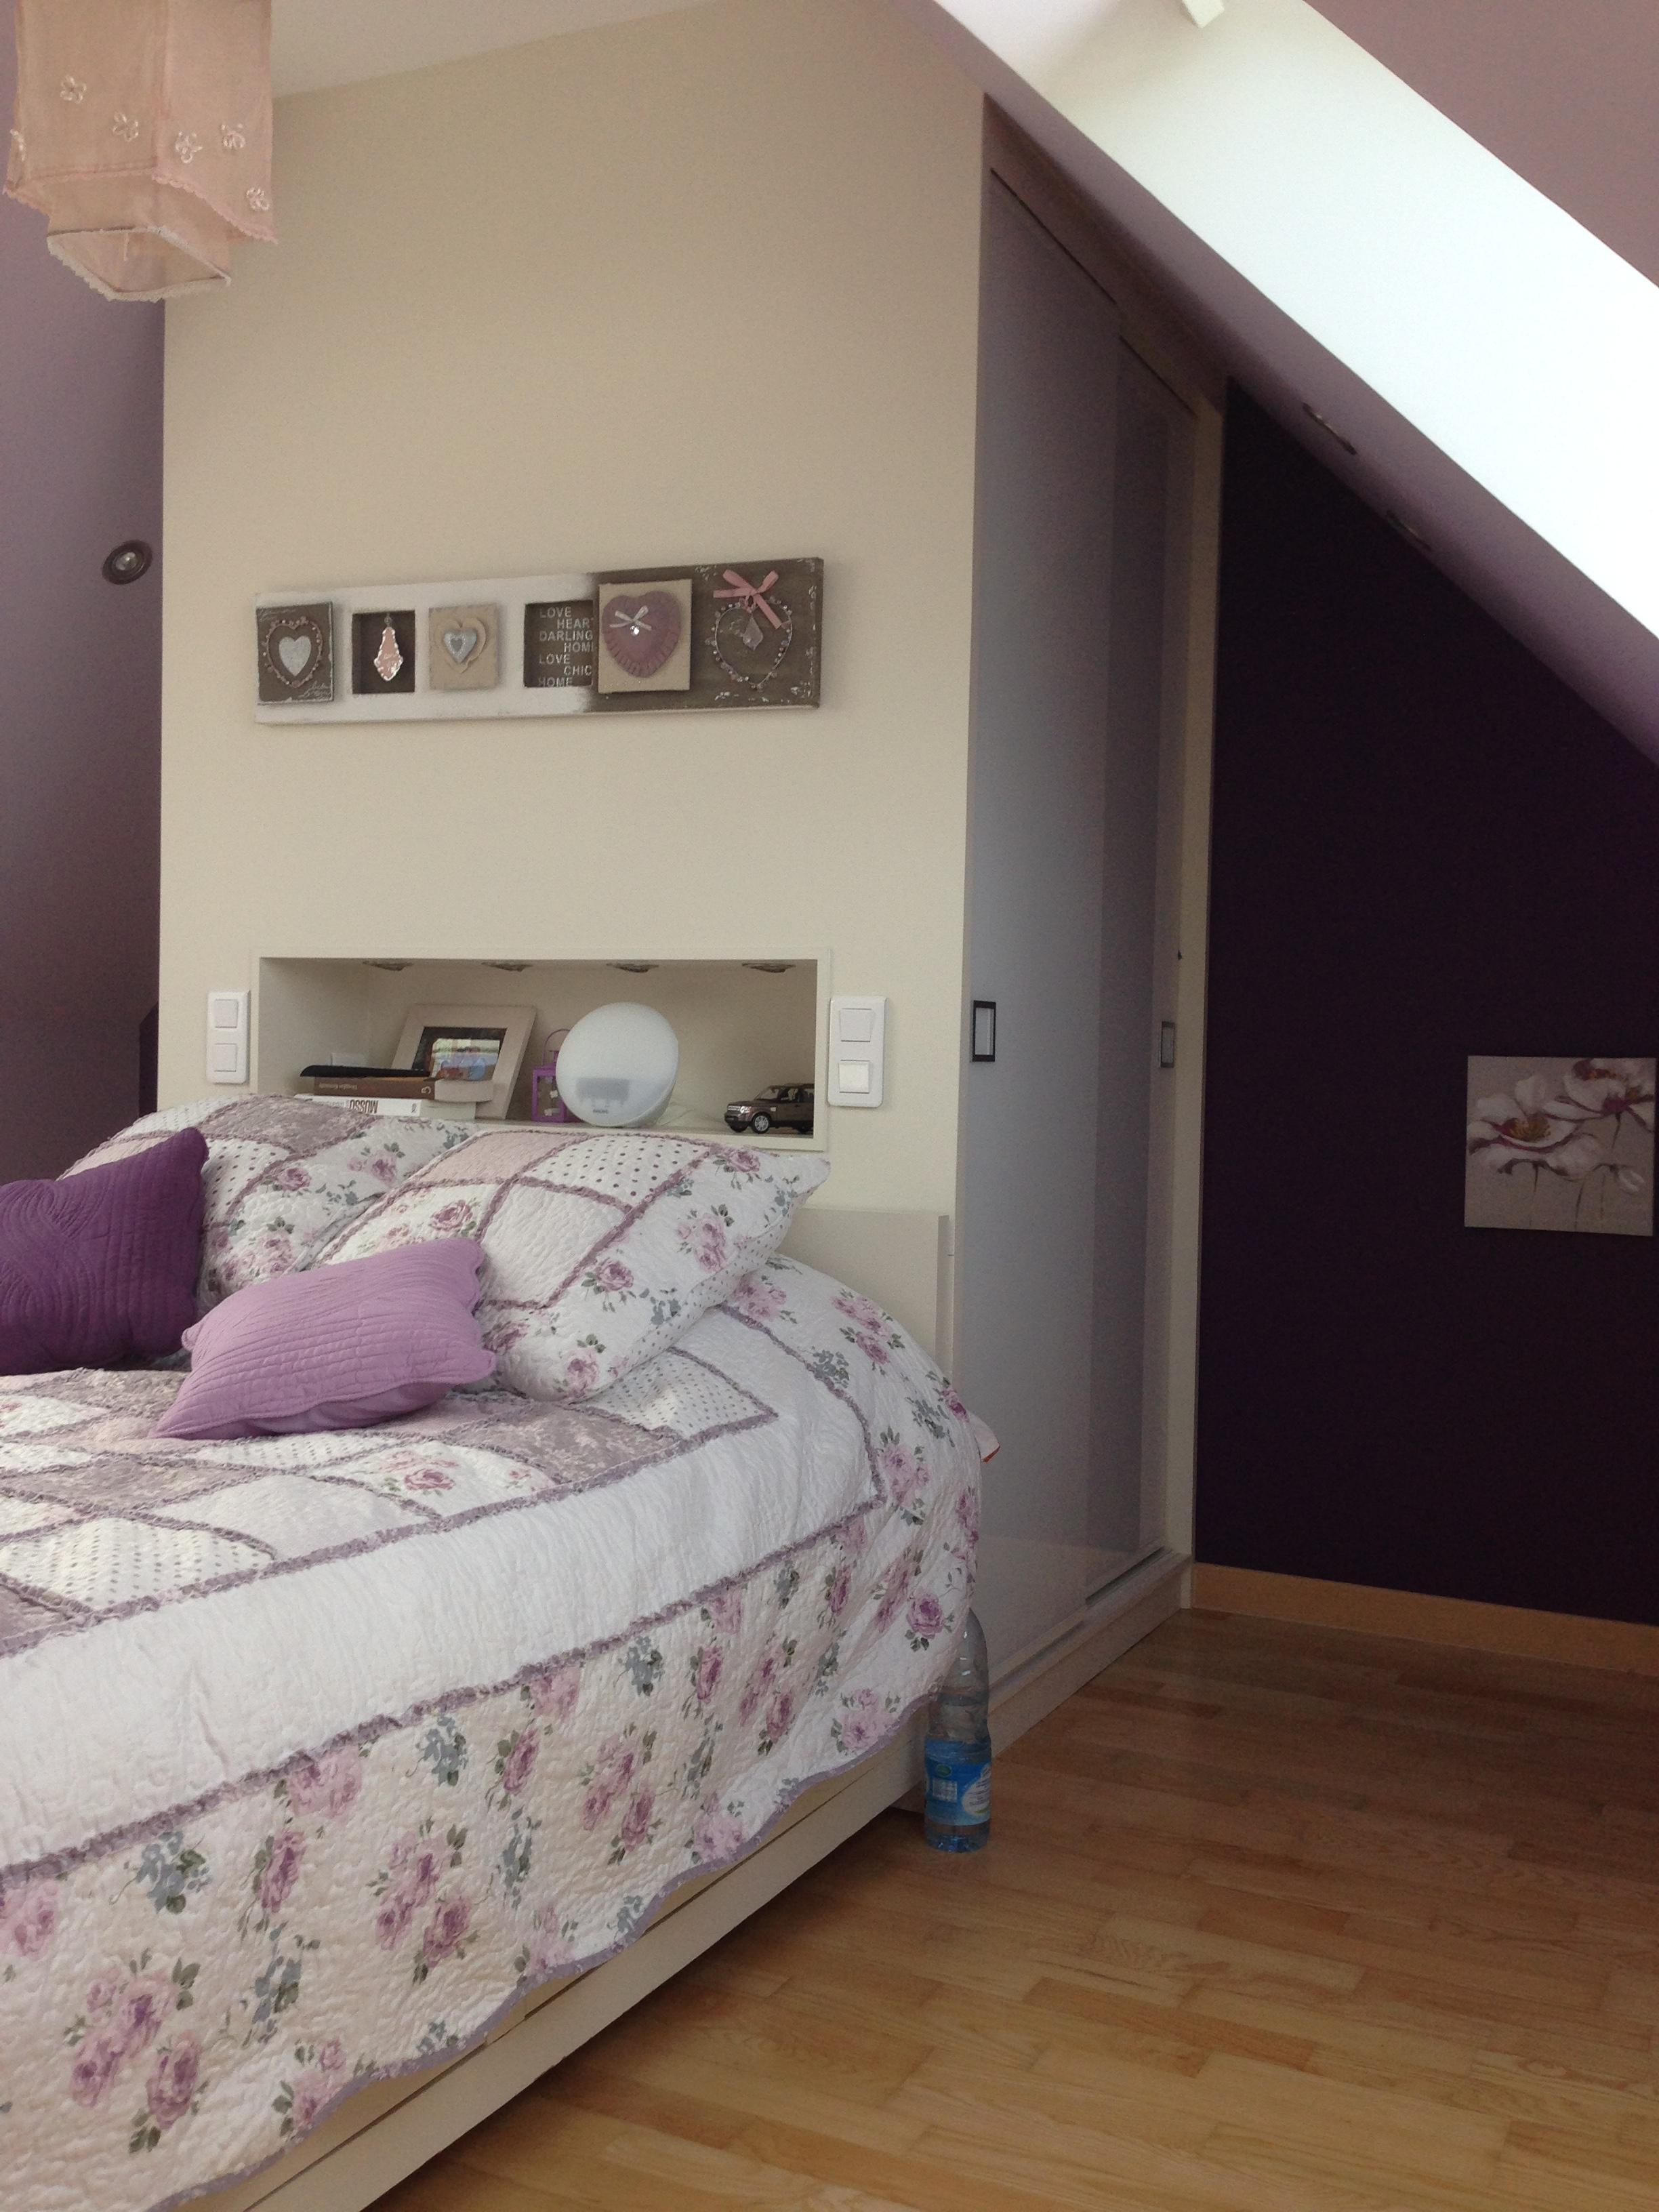 cr ation placards sur mesure daniel gar on. Black Bedroom Furniture Sets. Home Design Ideas